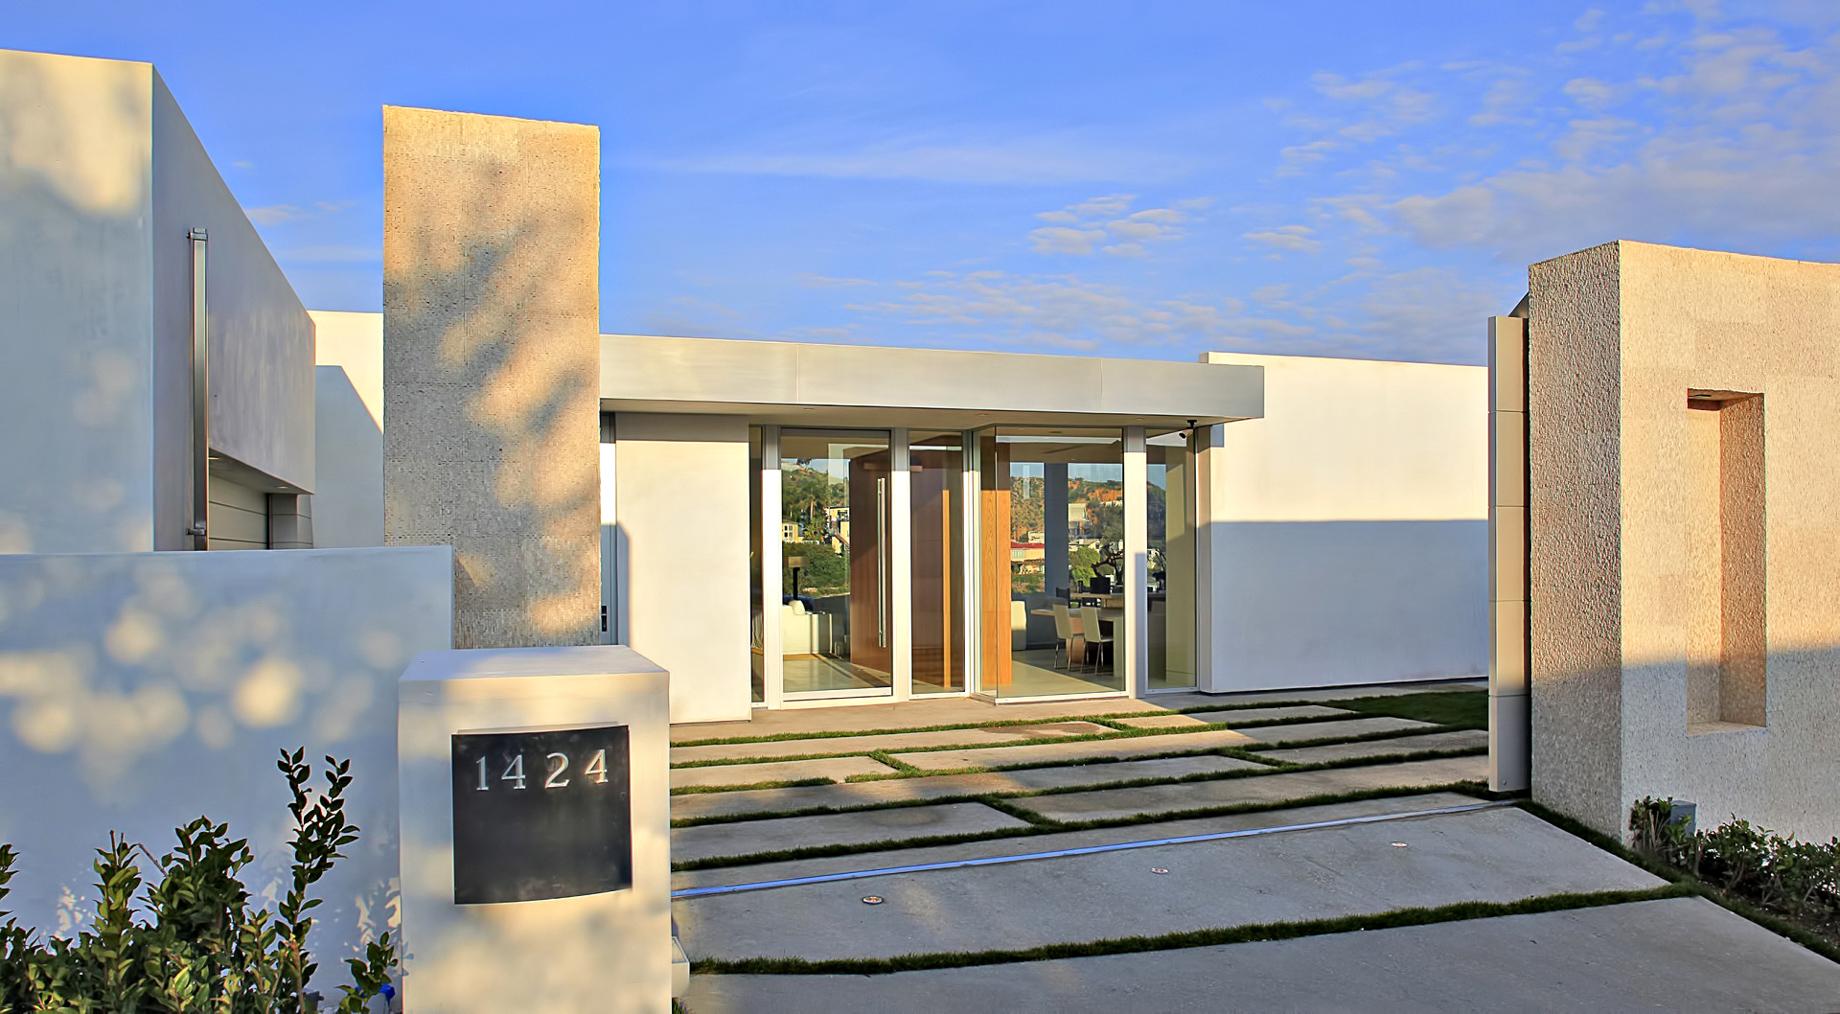 Bird Streets Modern – 1424 Tanager Way, Los Angeles, CA, USA